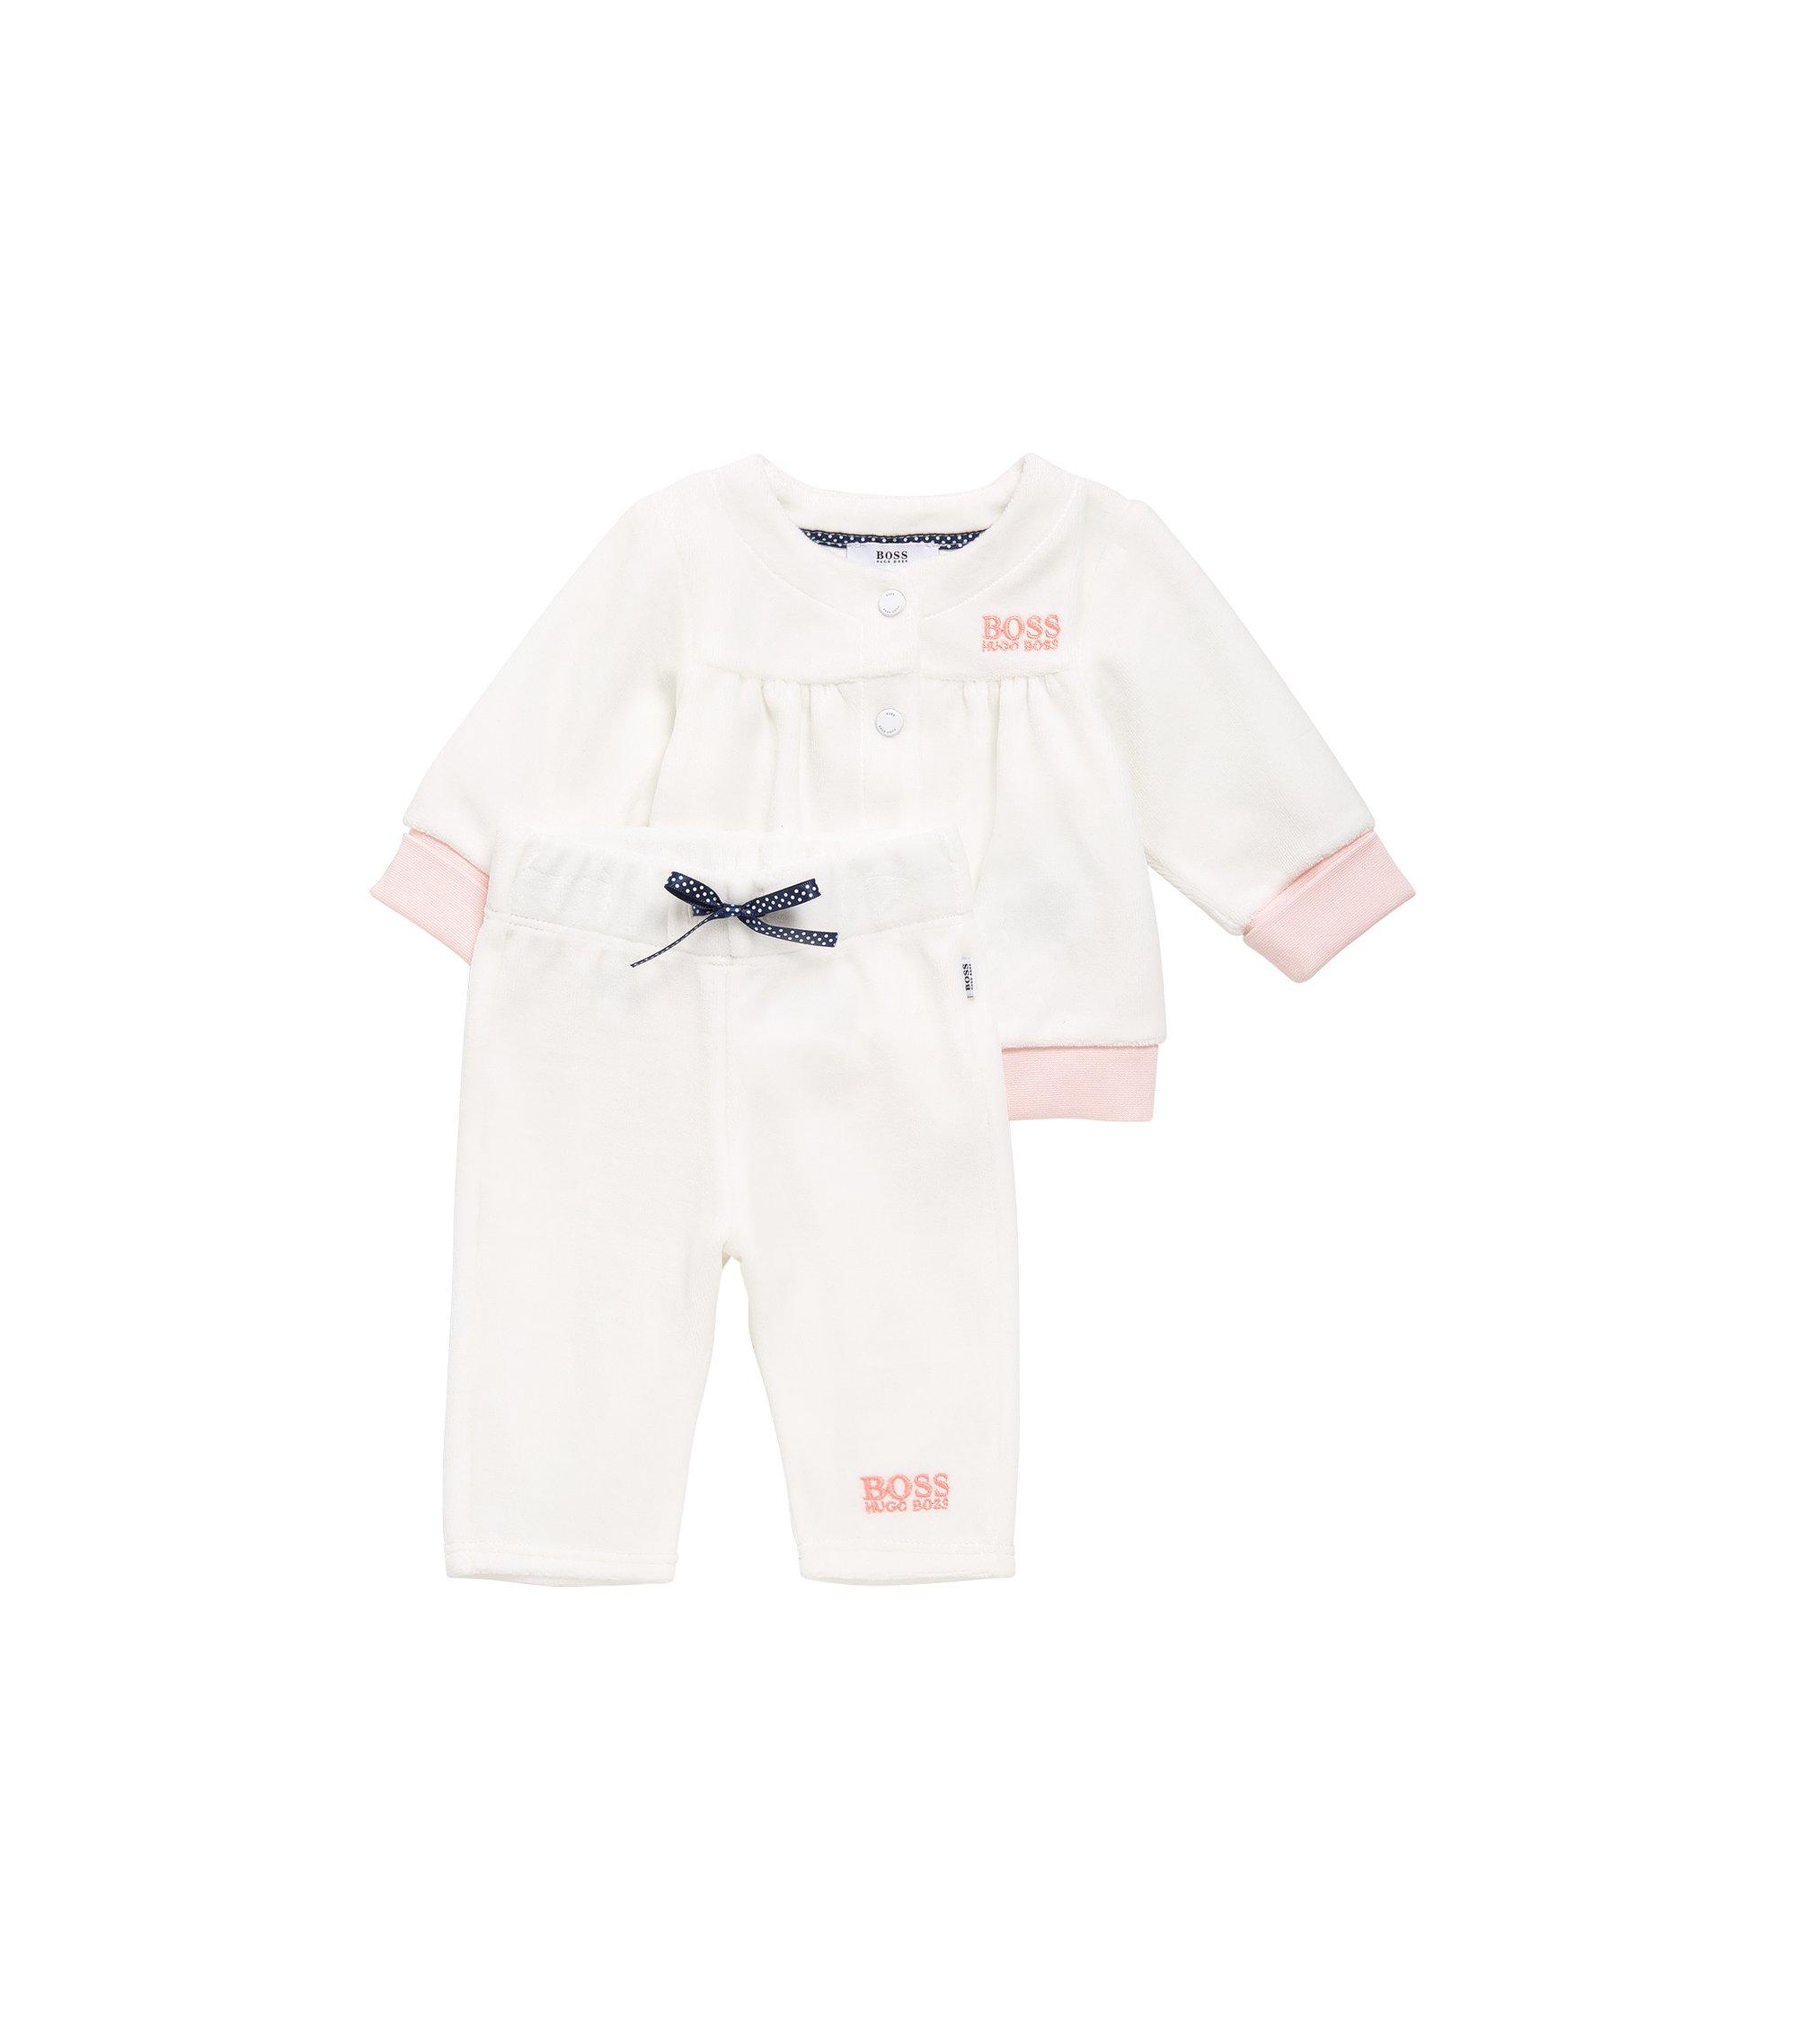 Cazadora y pantalón para bebé en mezcla de algodón: 'J97107', Natural